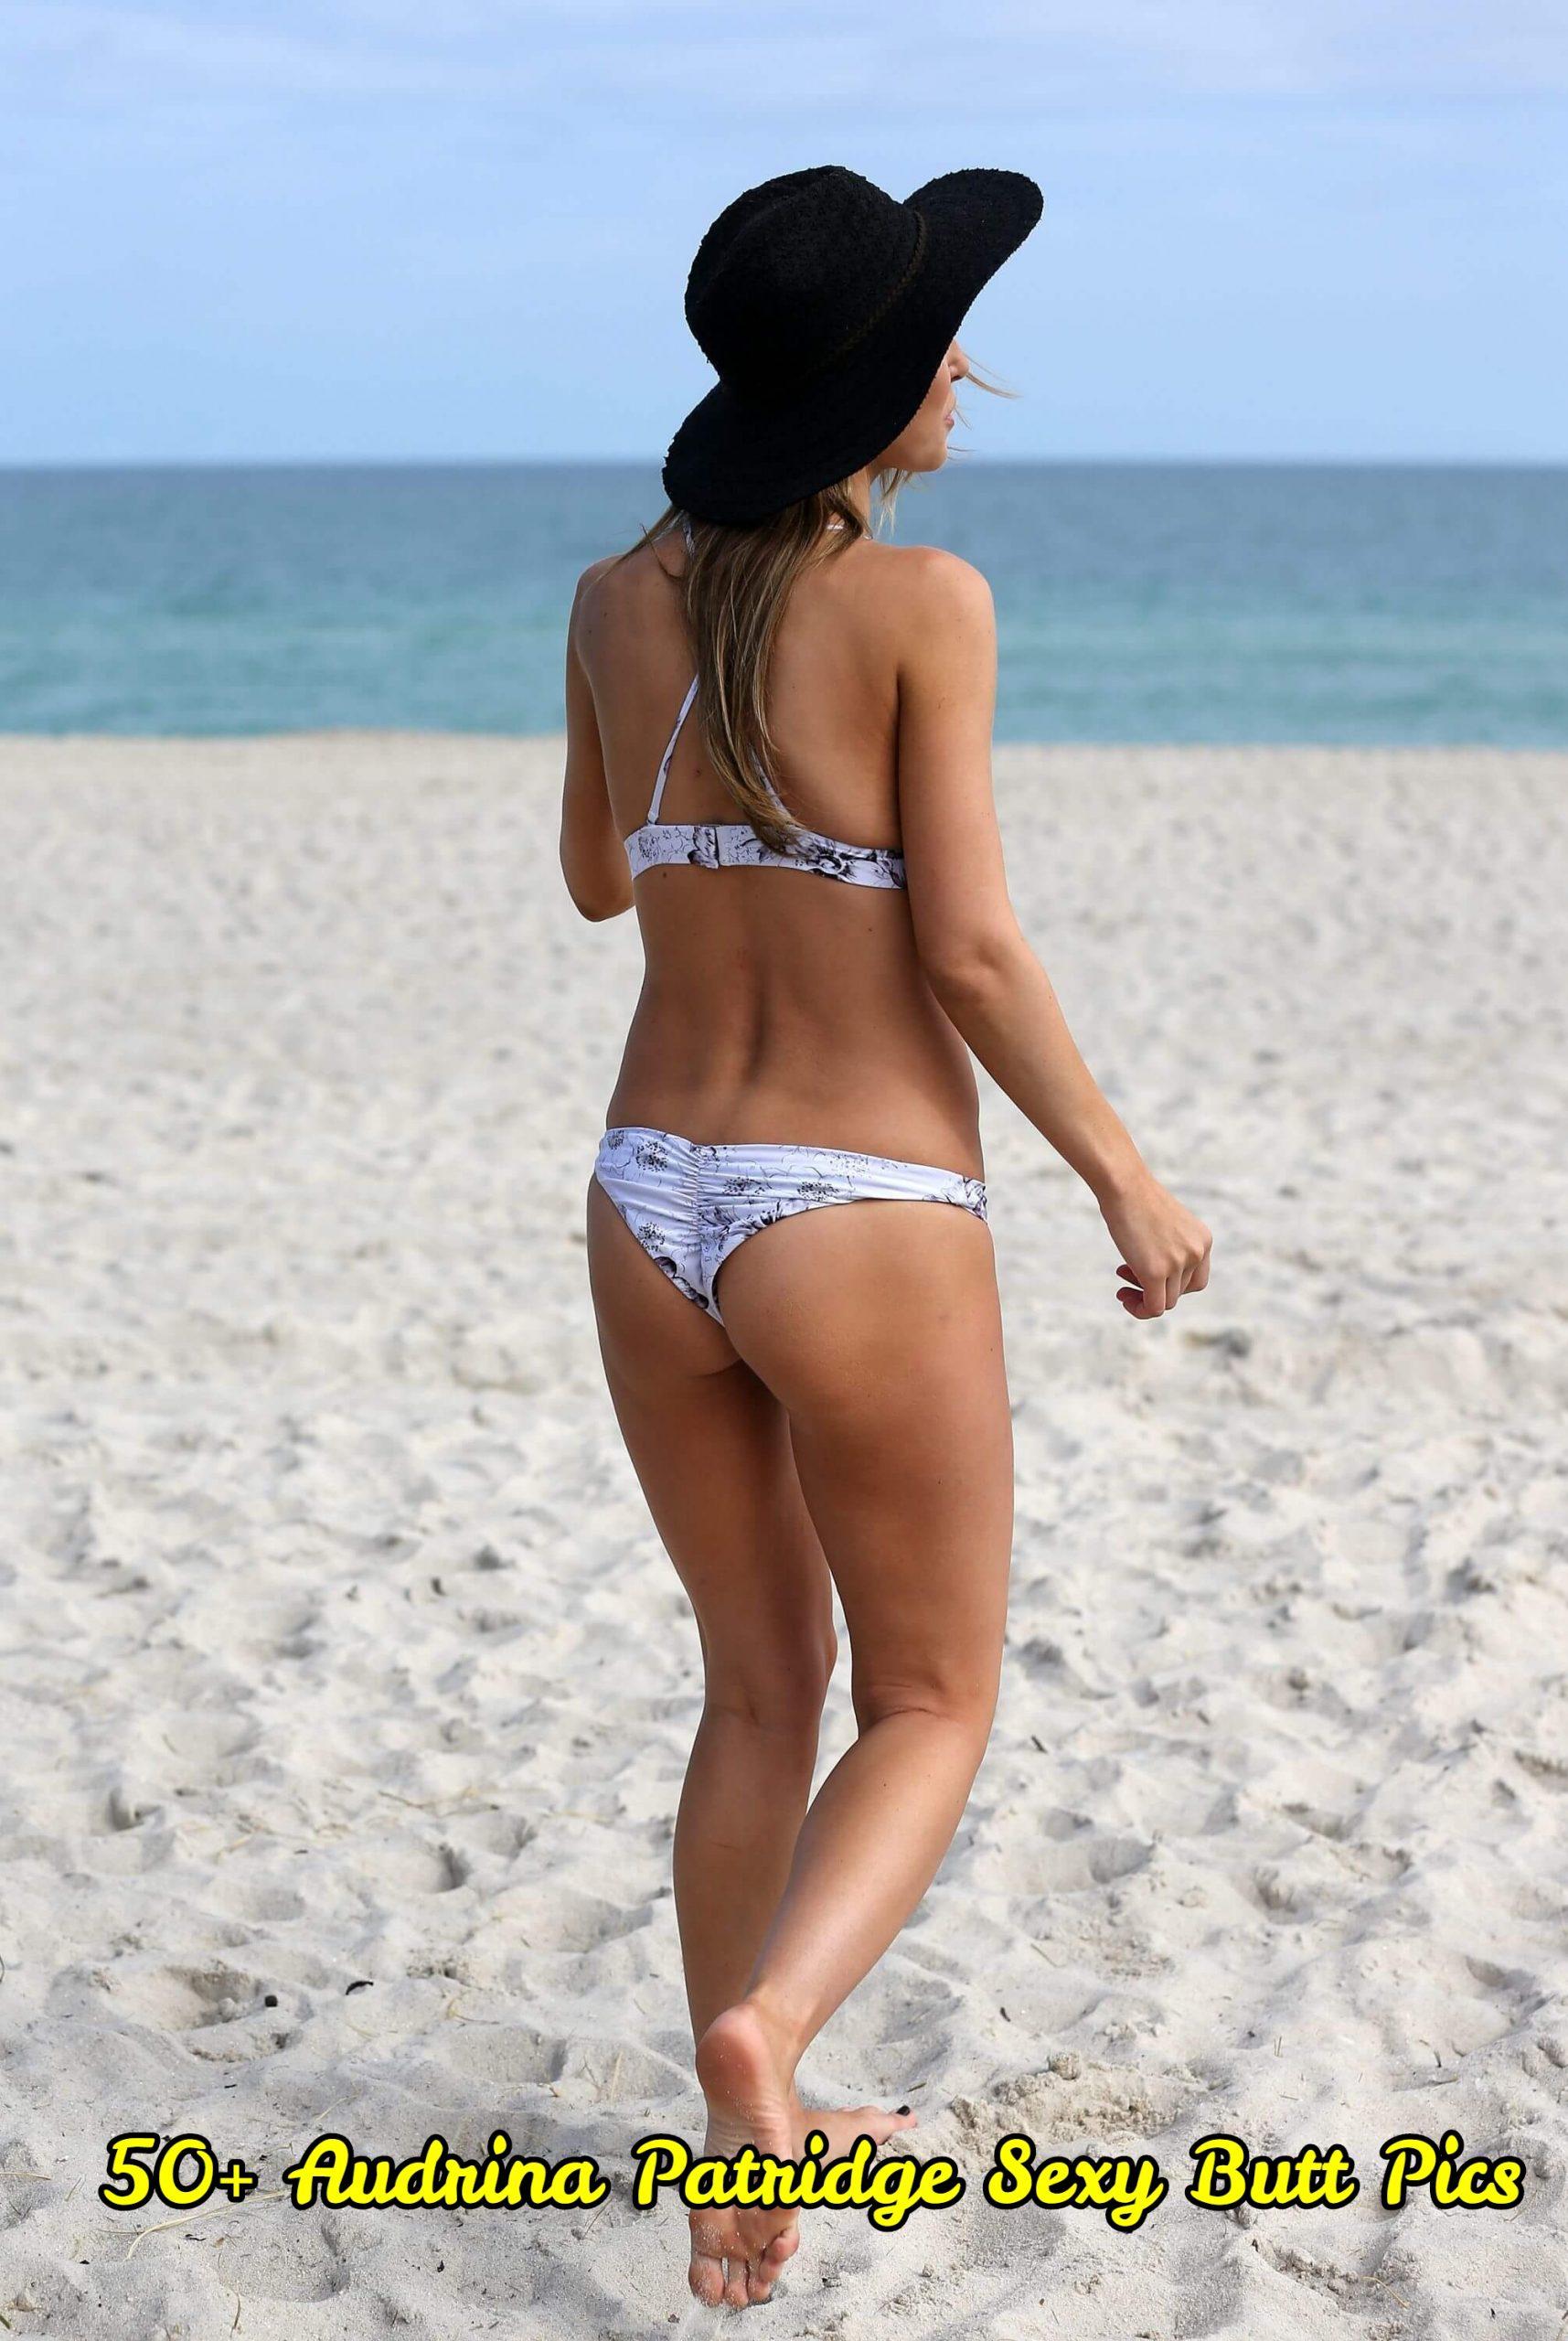 Audrina Patridge Sexy Butt Pics